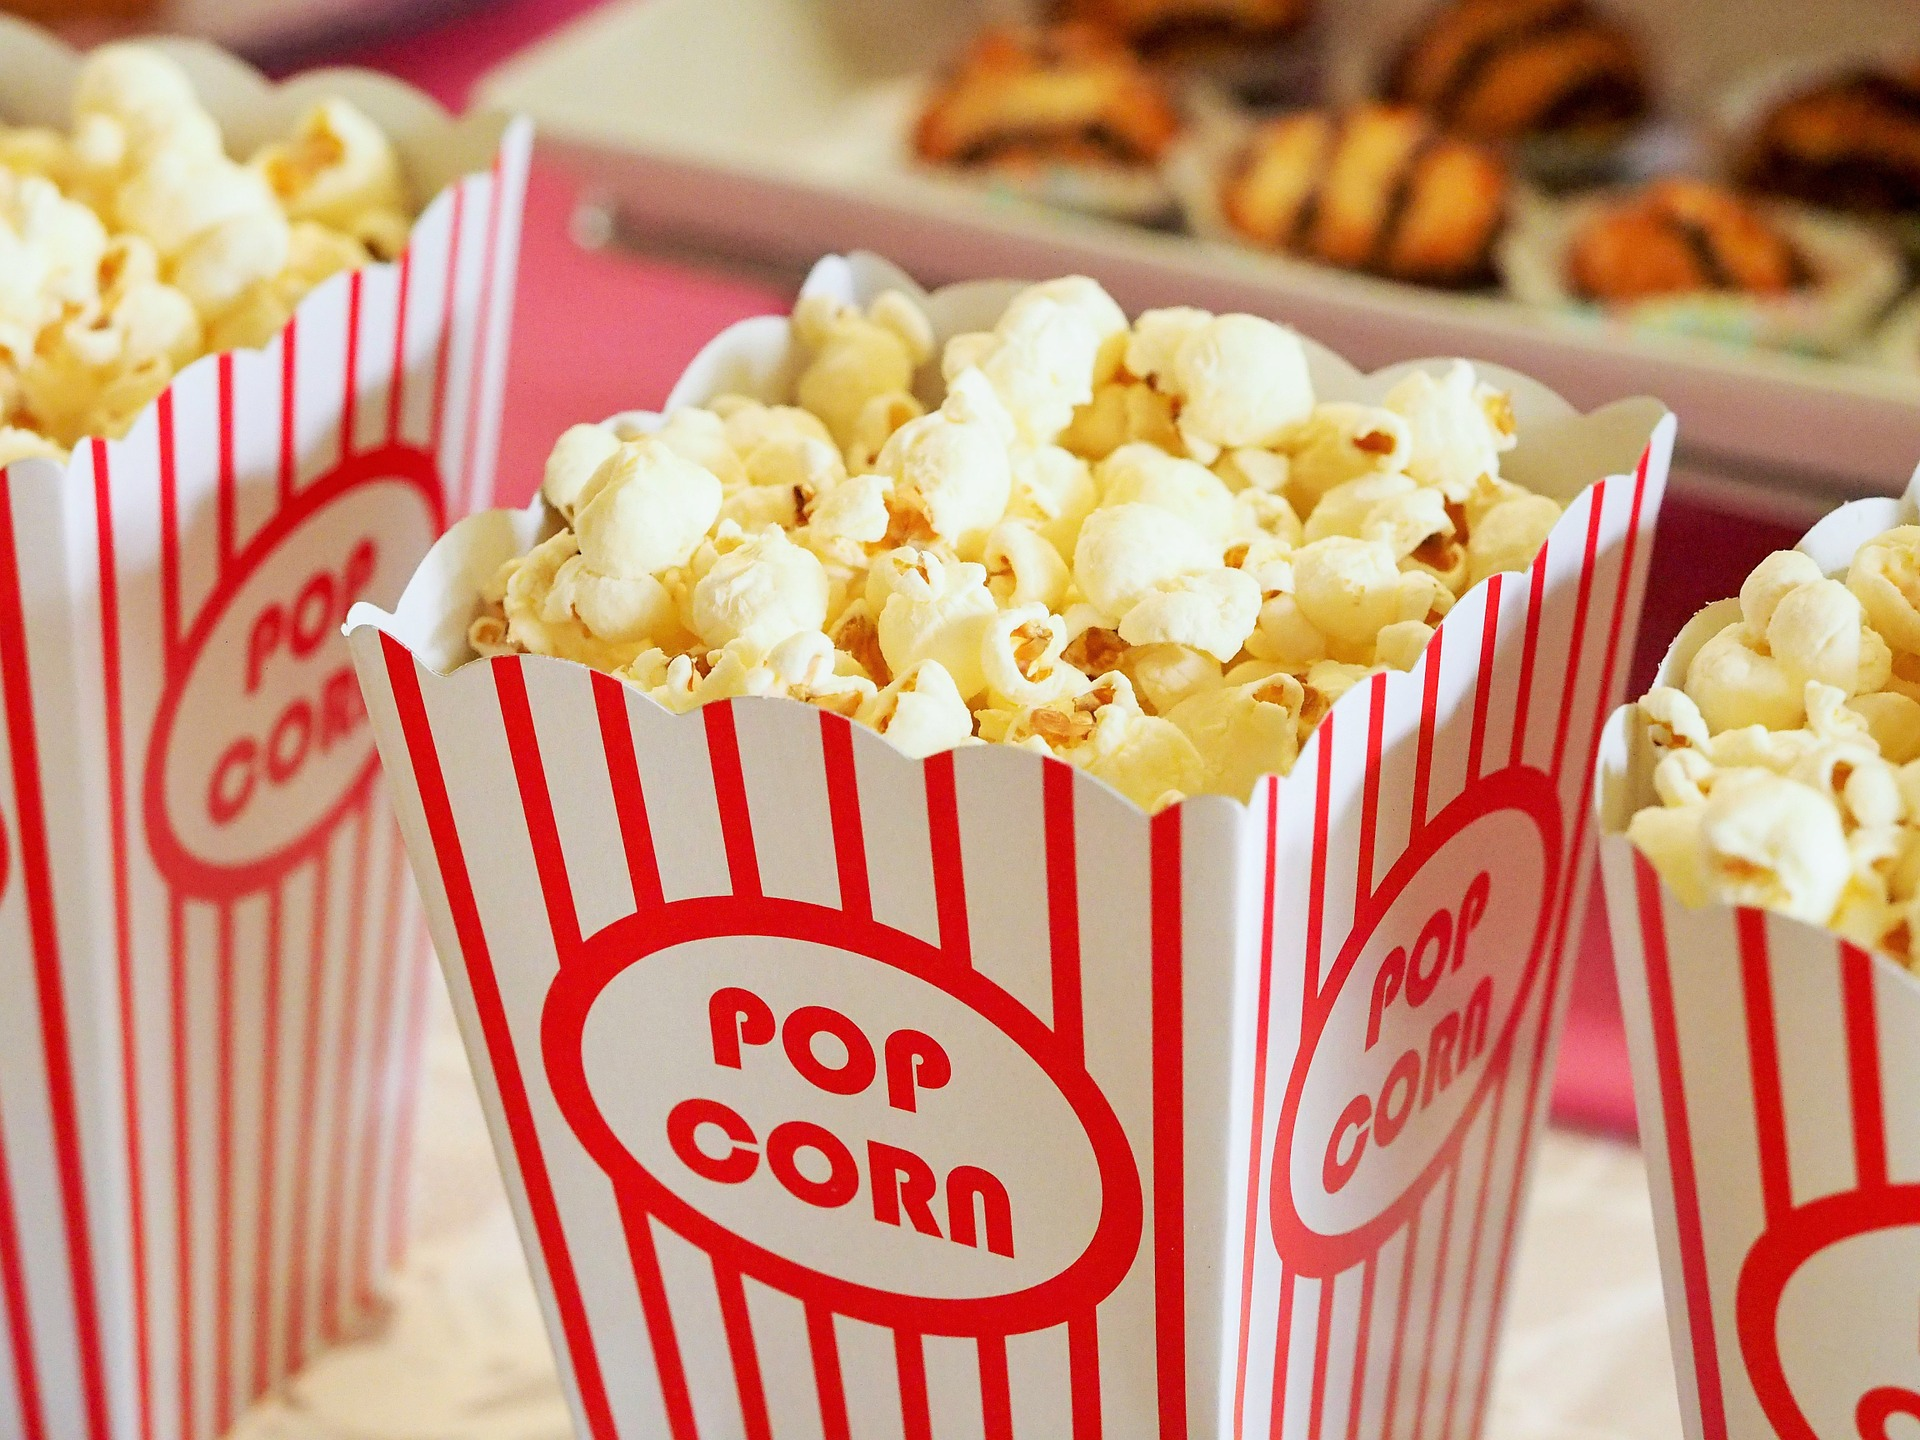 "<a href=""https://pixabay.com/en/popcorn-movie-party-entertainment-1085072/"">Popcorn | © dbreen/Pixabay</a>"